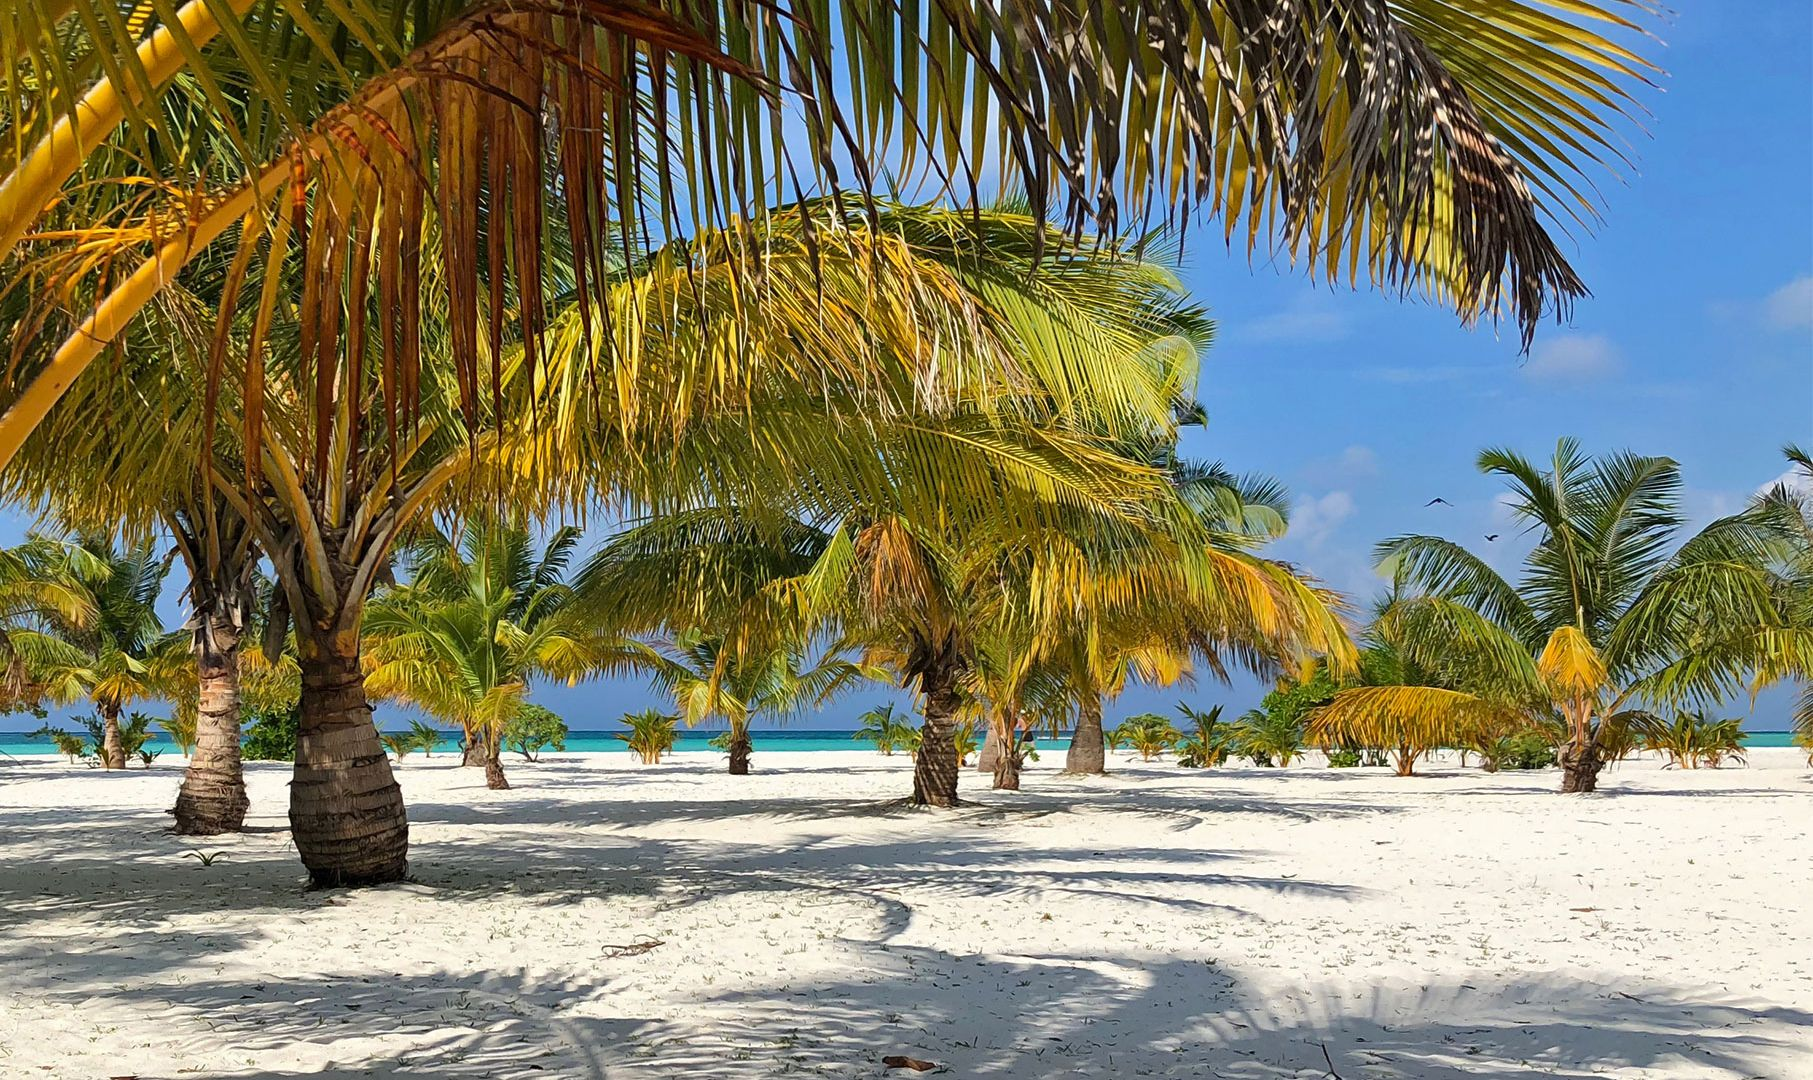 Paste 2022 - Sejur plaja Maldive, 12 zile